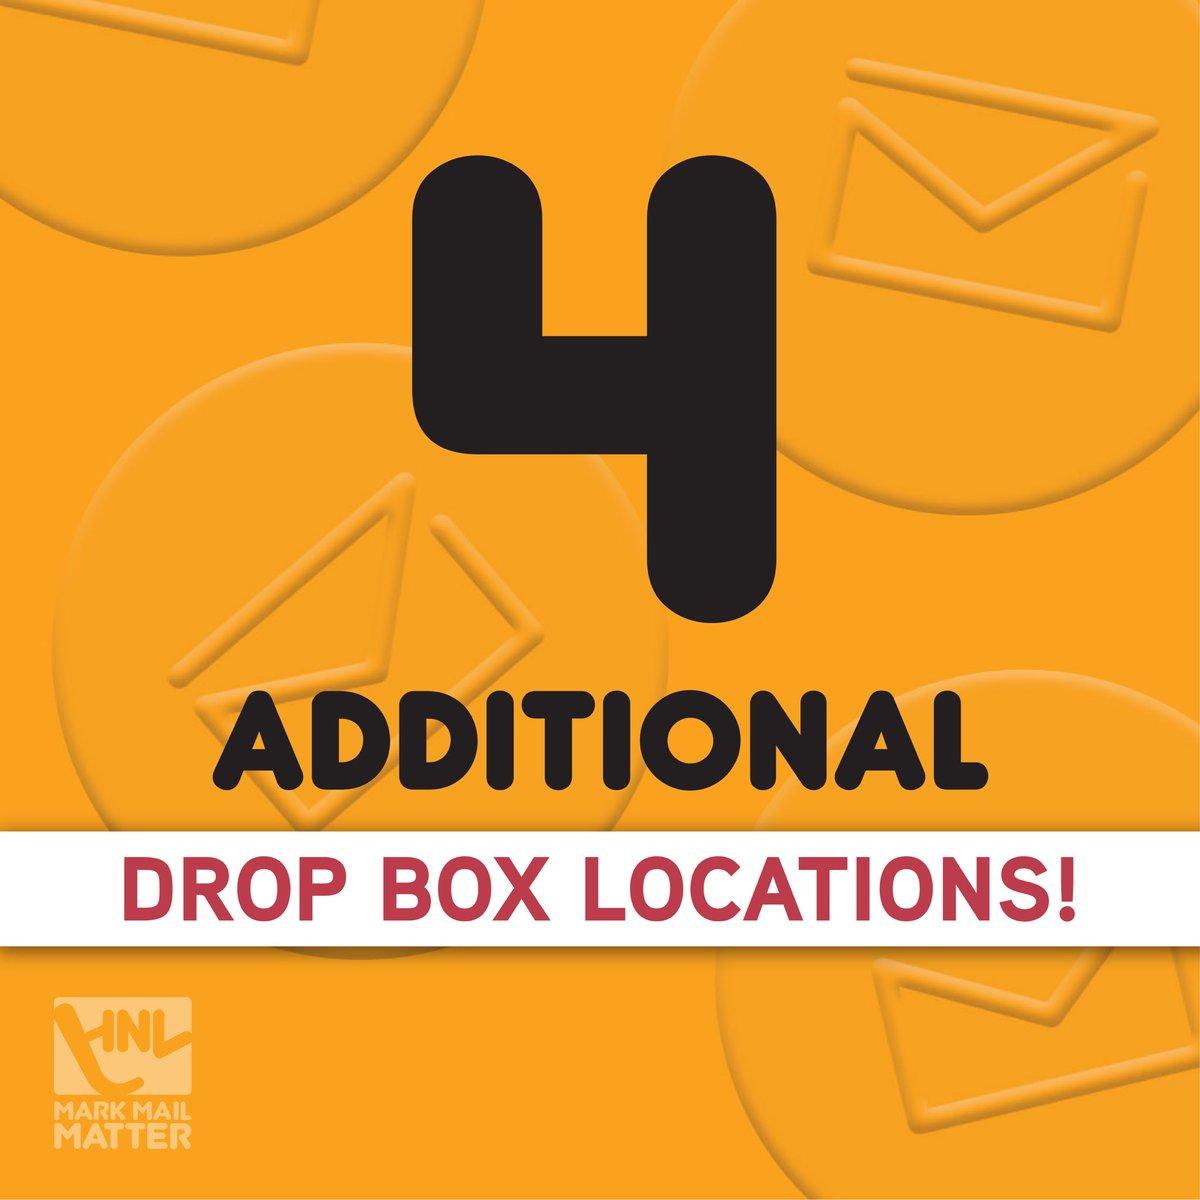 RT @HNLelections: #newballotdropboxlocations #hnlelections #voting #honolulu #oahu